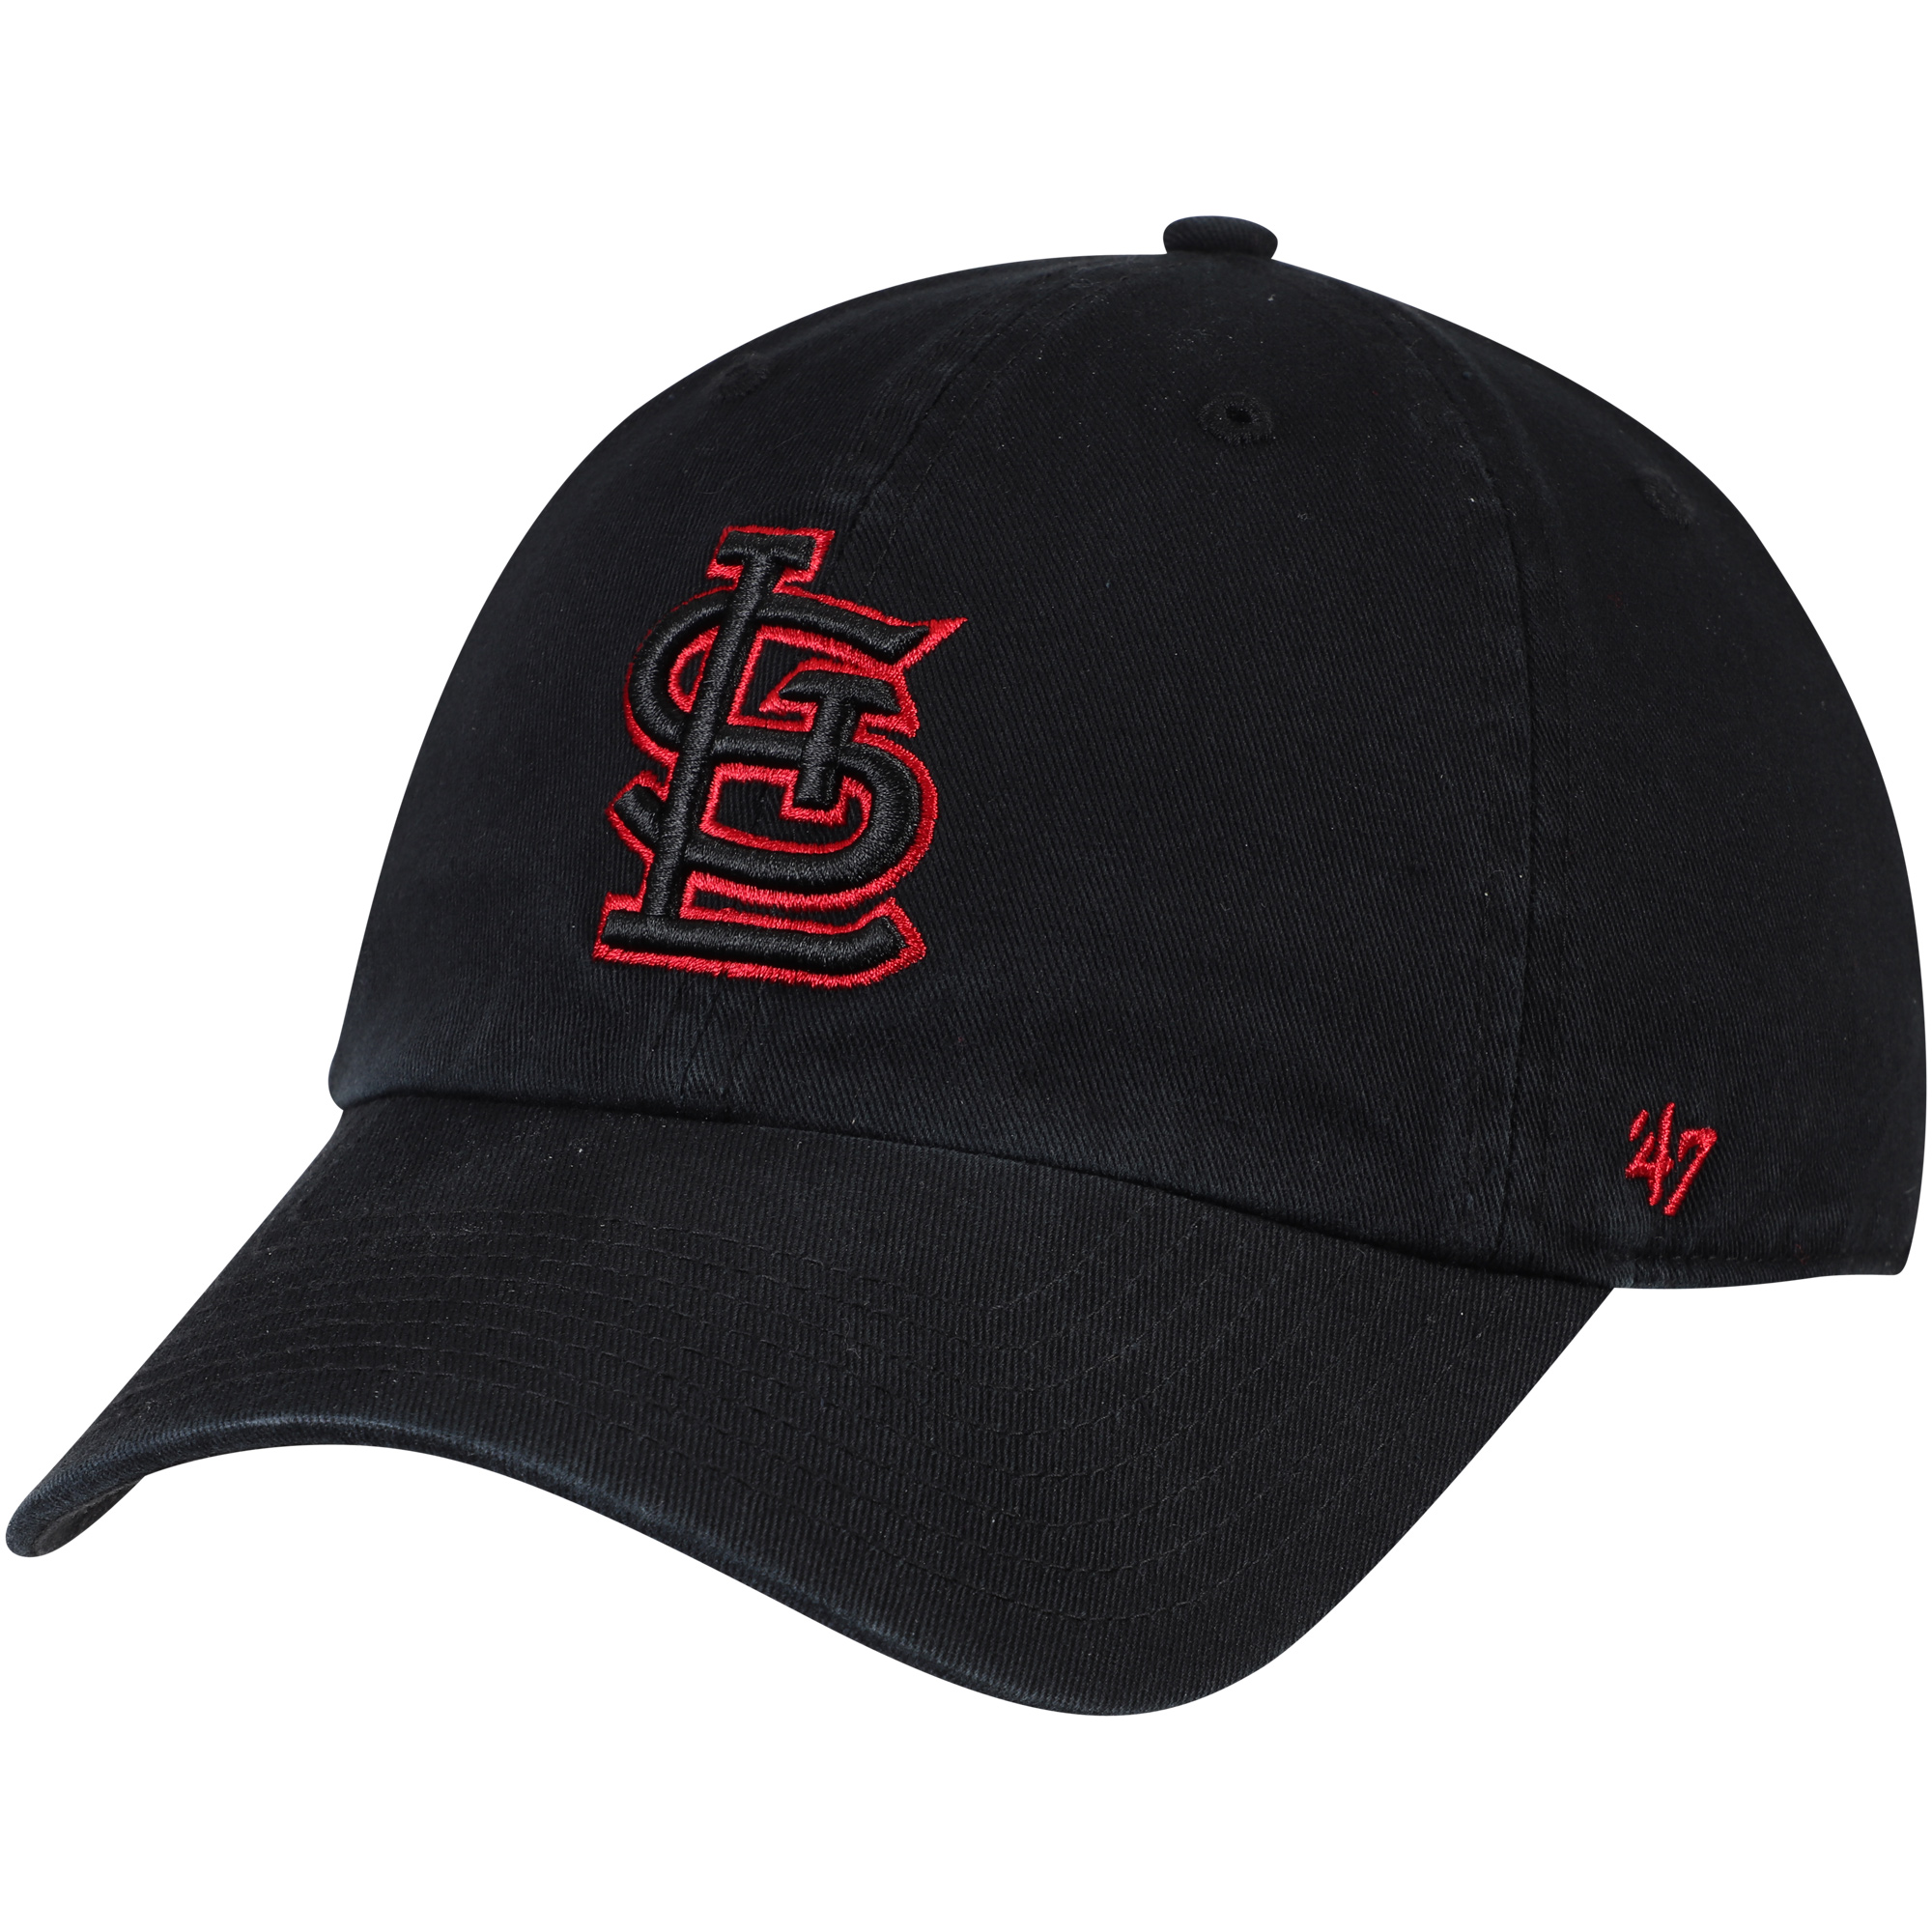 St. Louis Cardinals '47 Team Color Clean Up Adjustable Hat - Black - OSFA